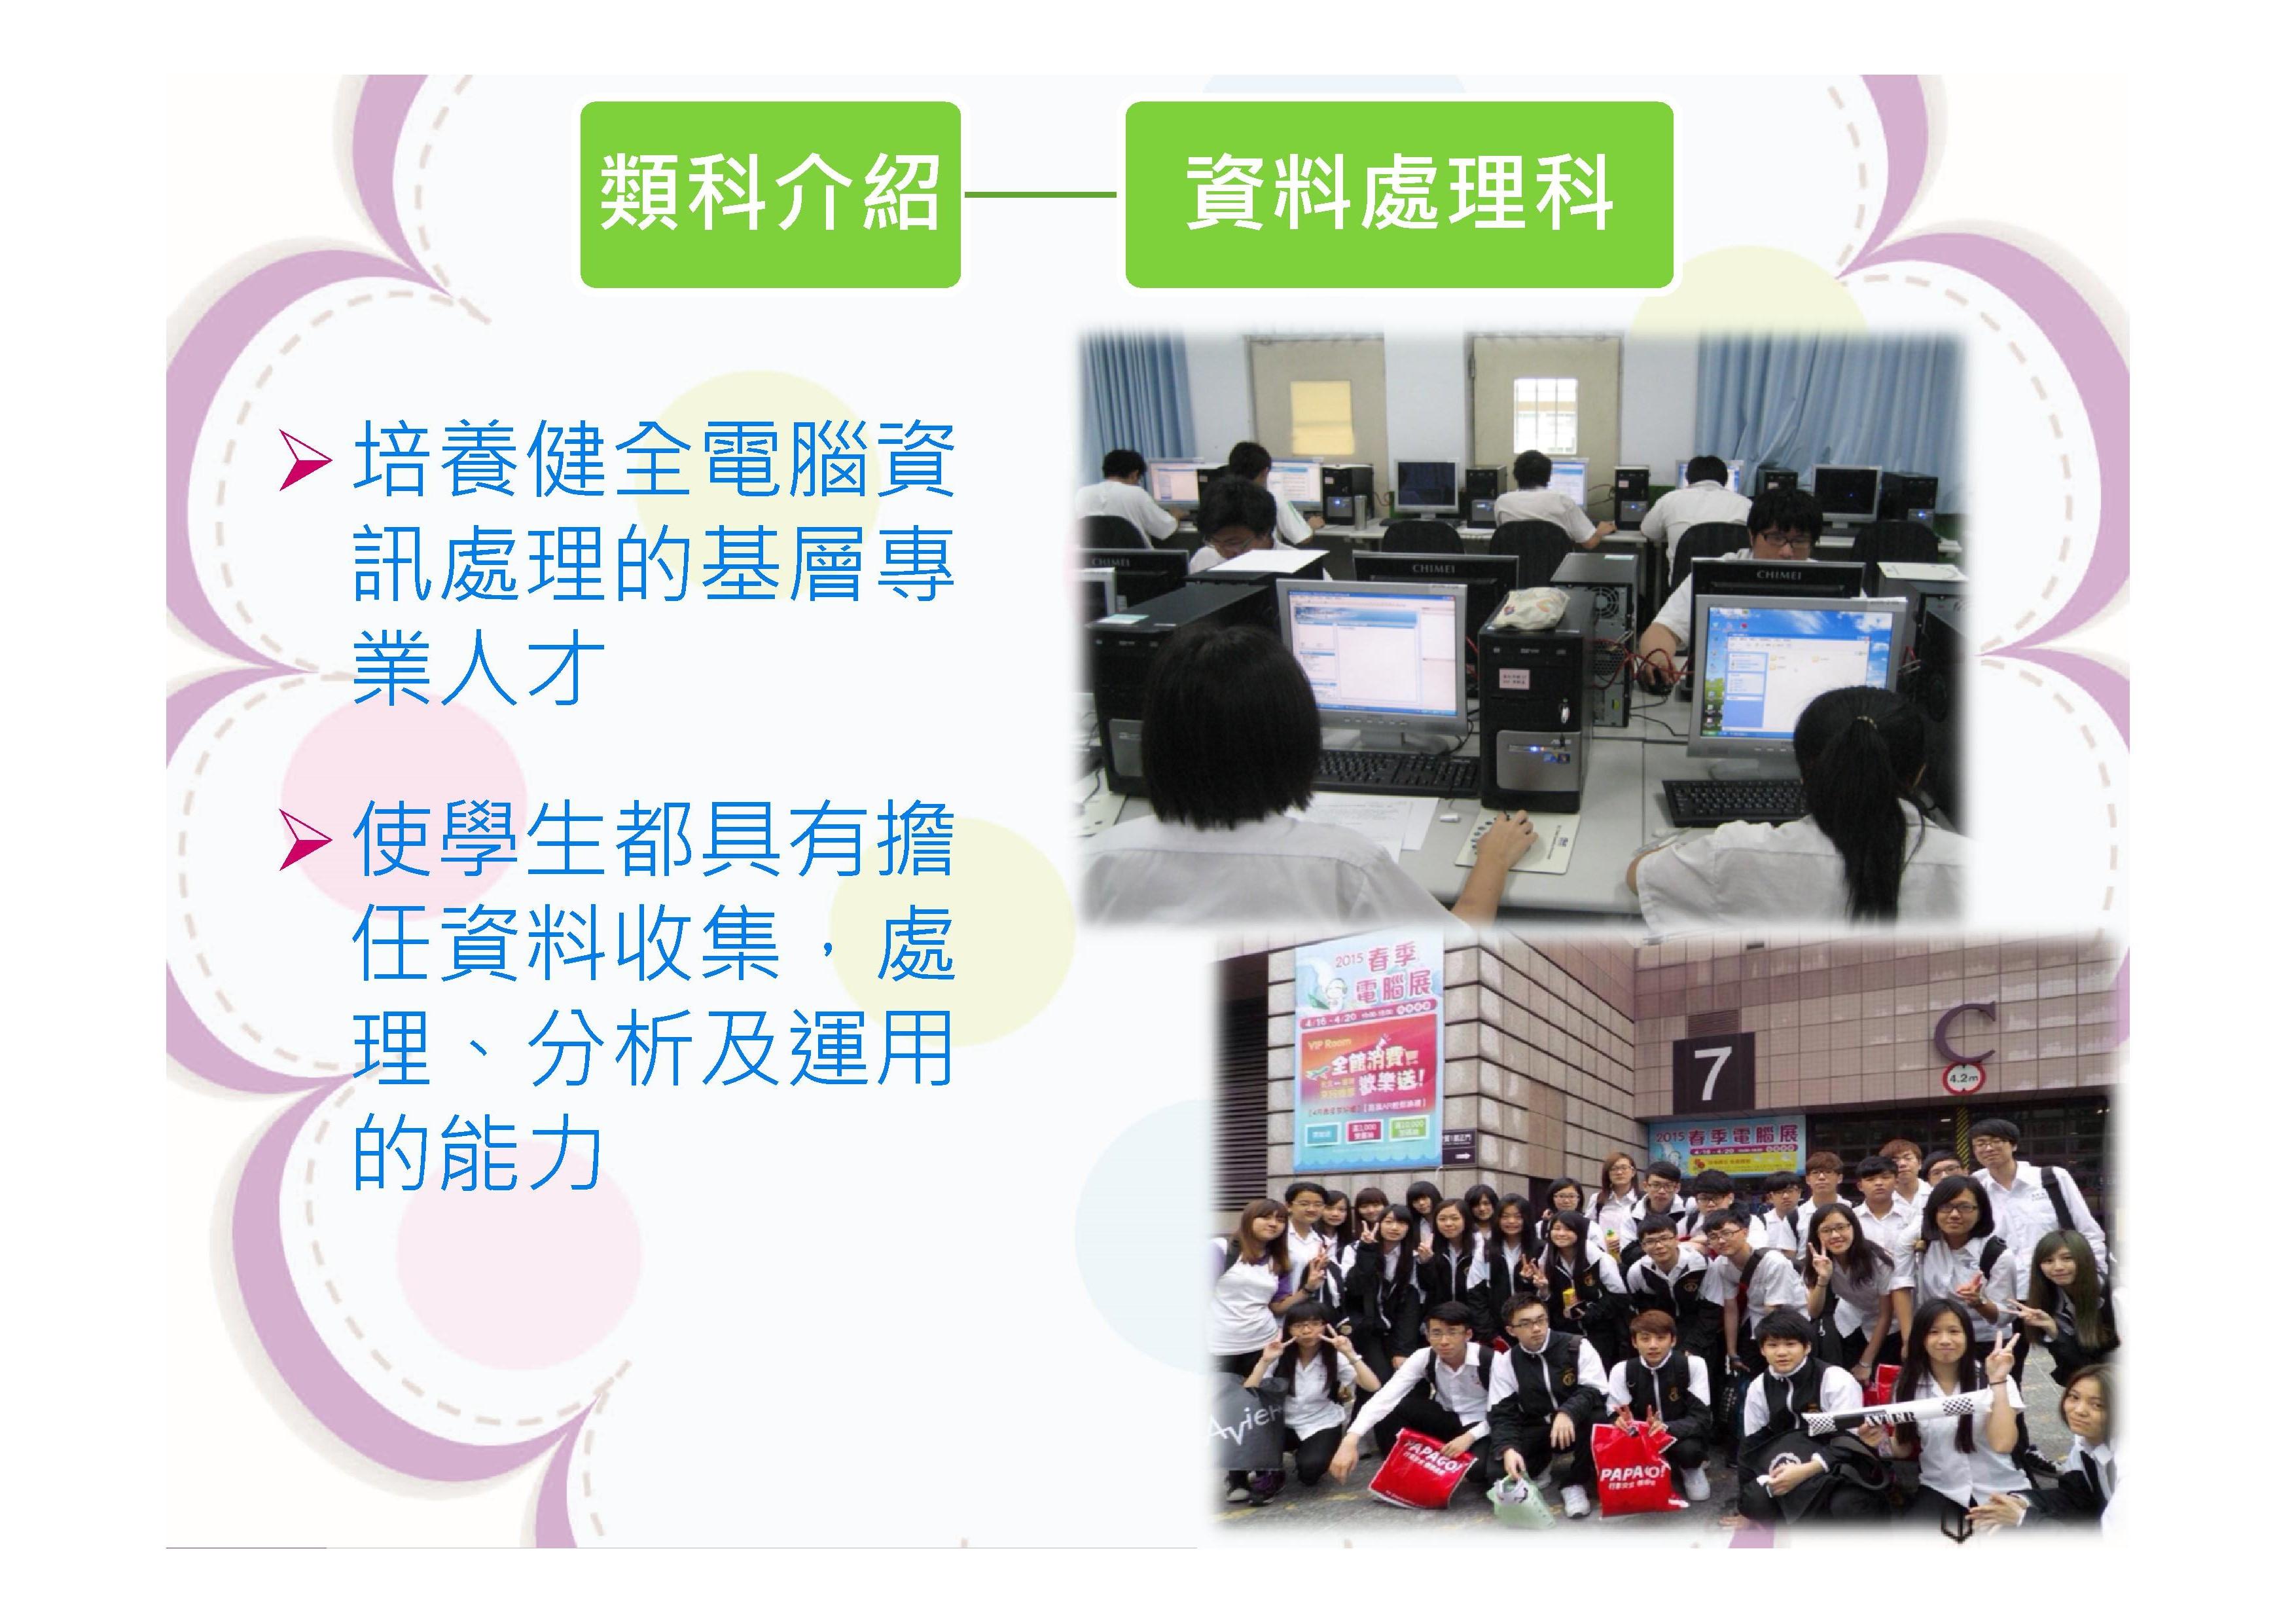 Microsoft PowerPoint - 技職教育暨士商簡介.pptx00016